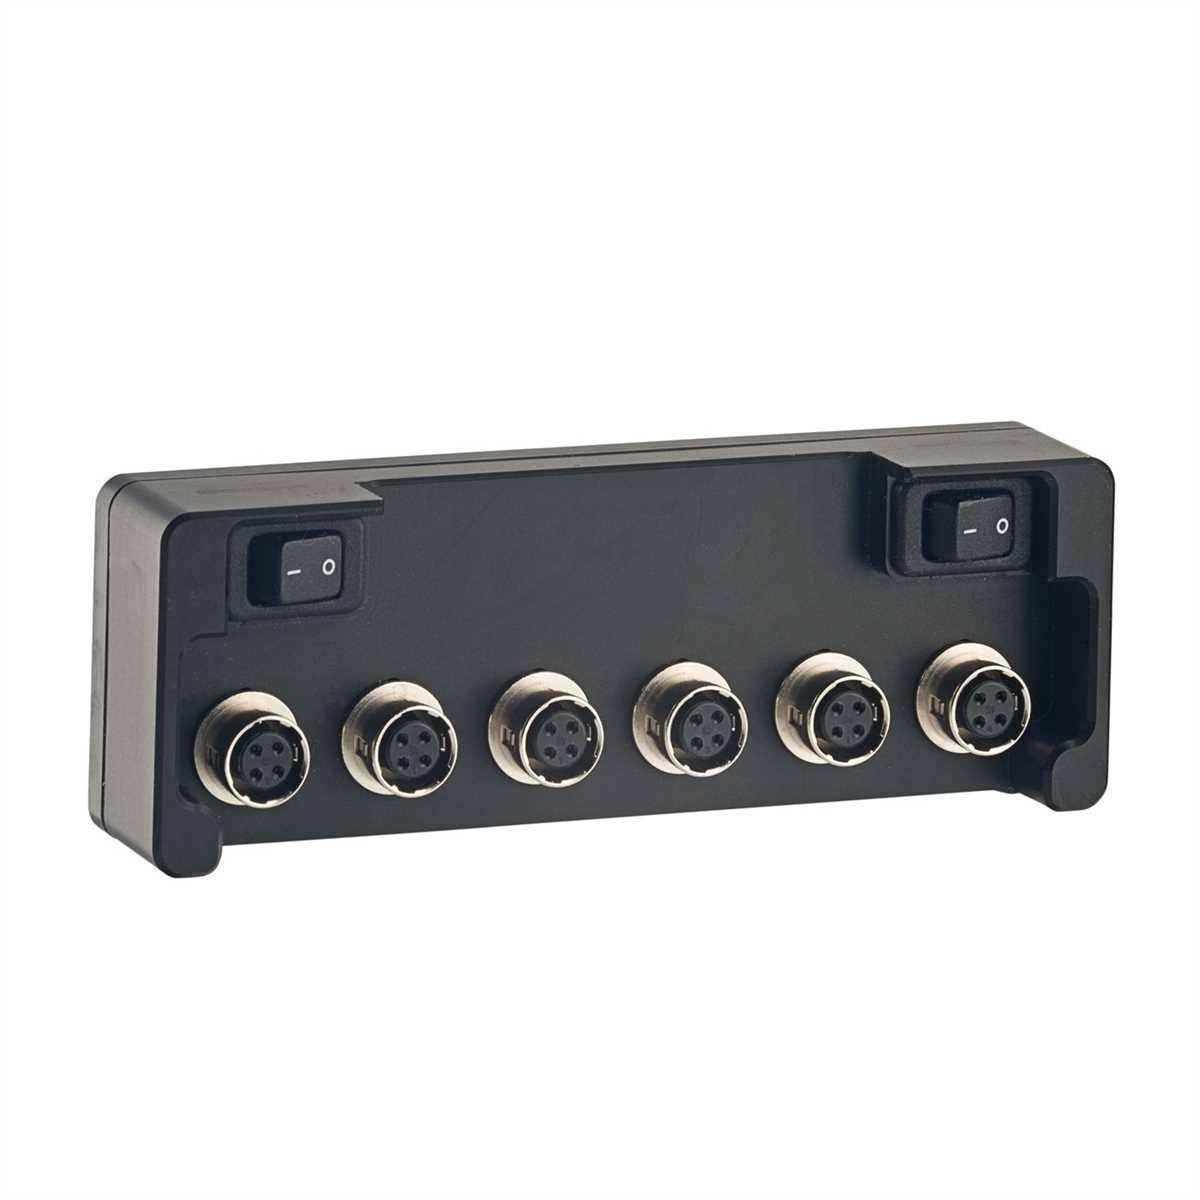 powerbar-6hr4_9141_1.jpg